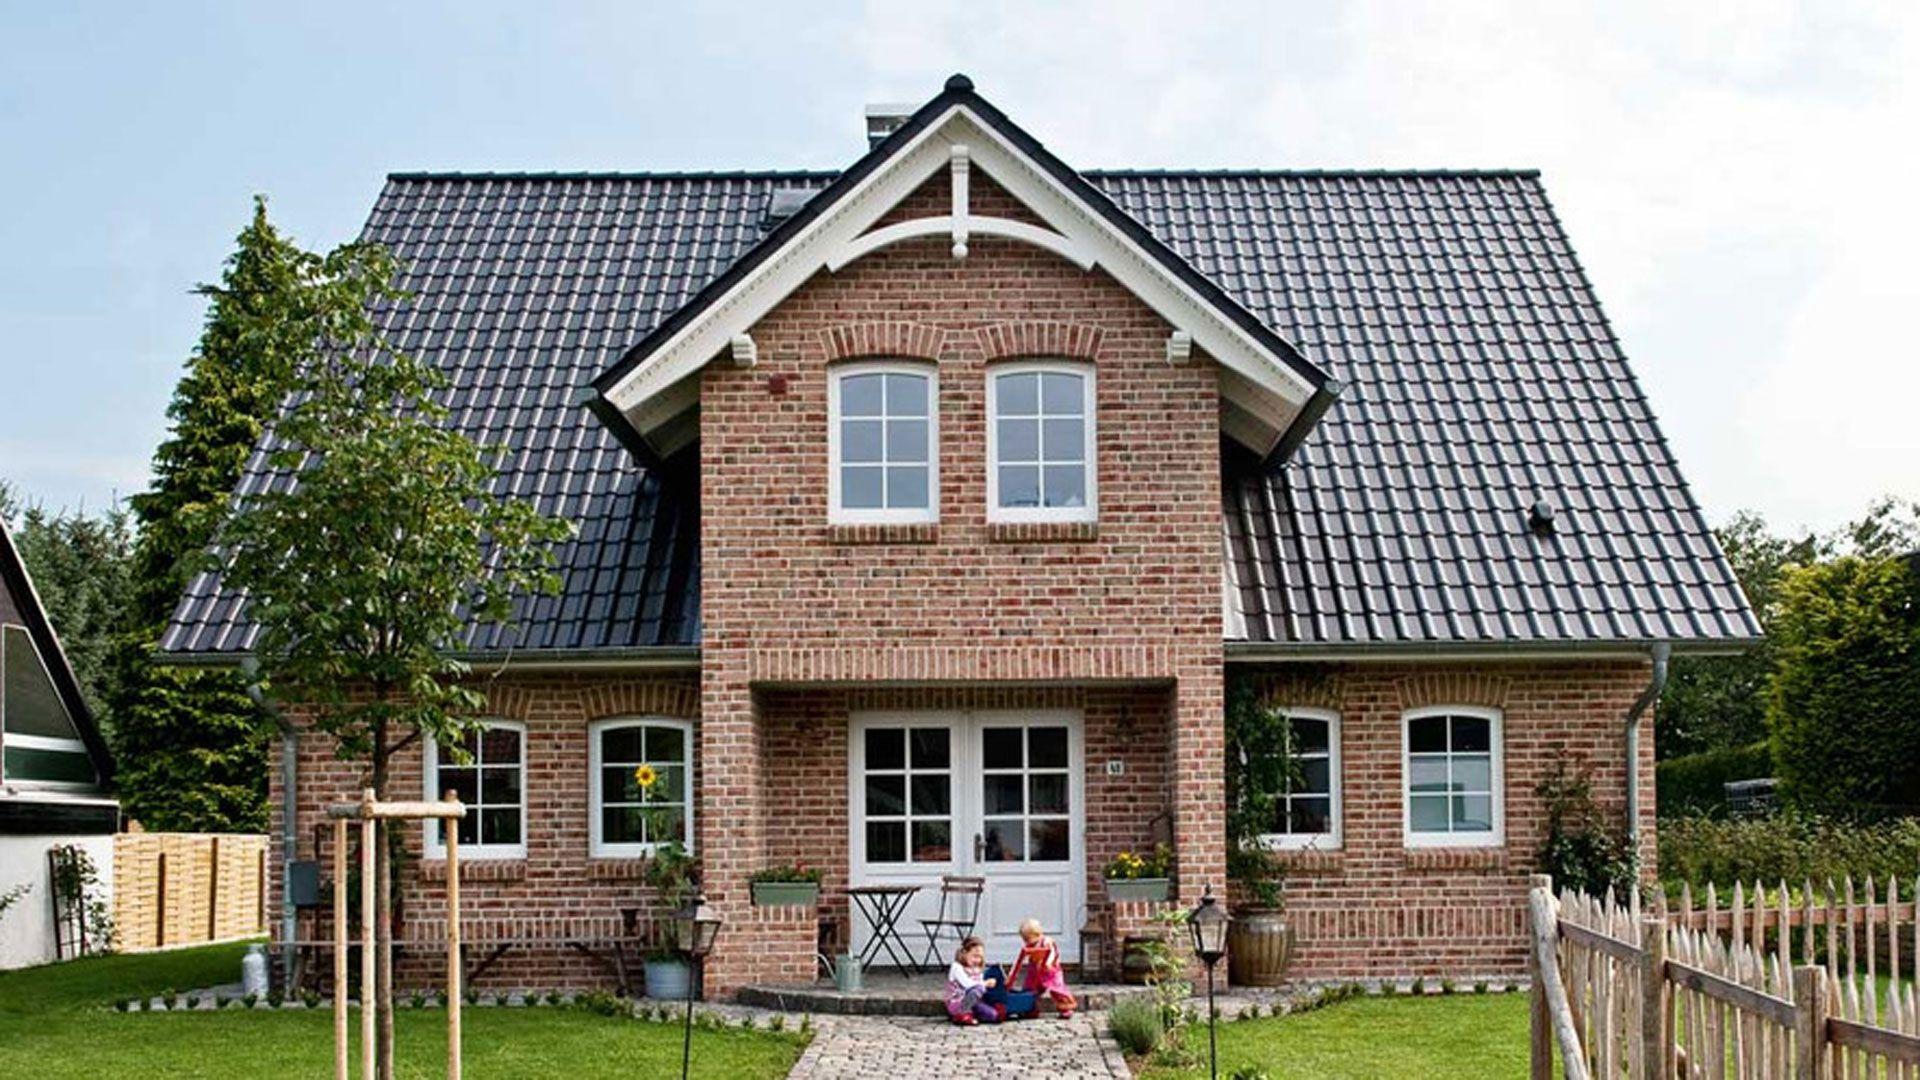 Bauherrenreportage Landhaus mit Liebe zum Detail Haus